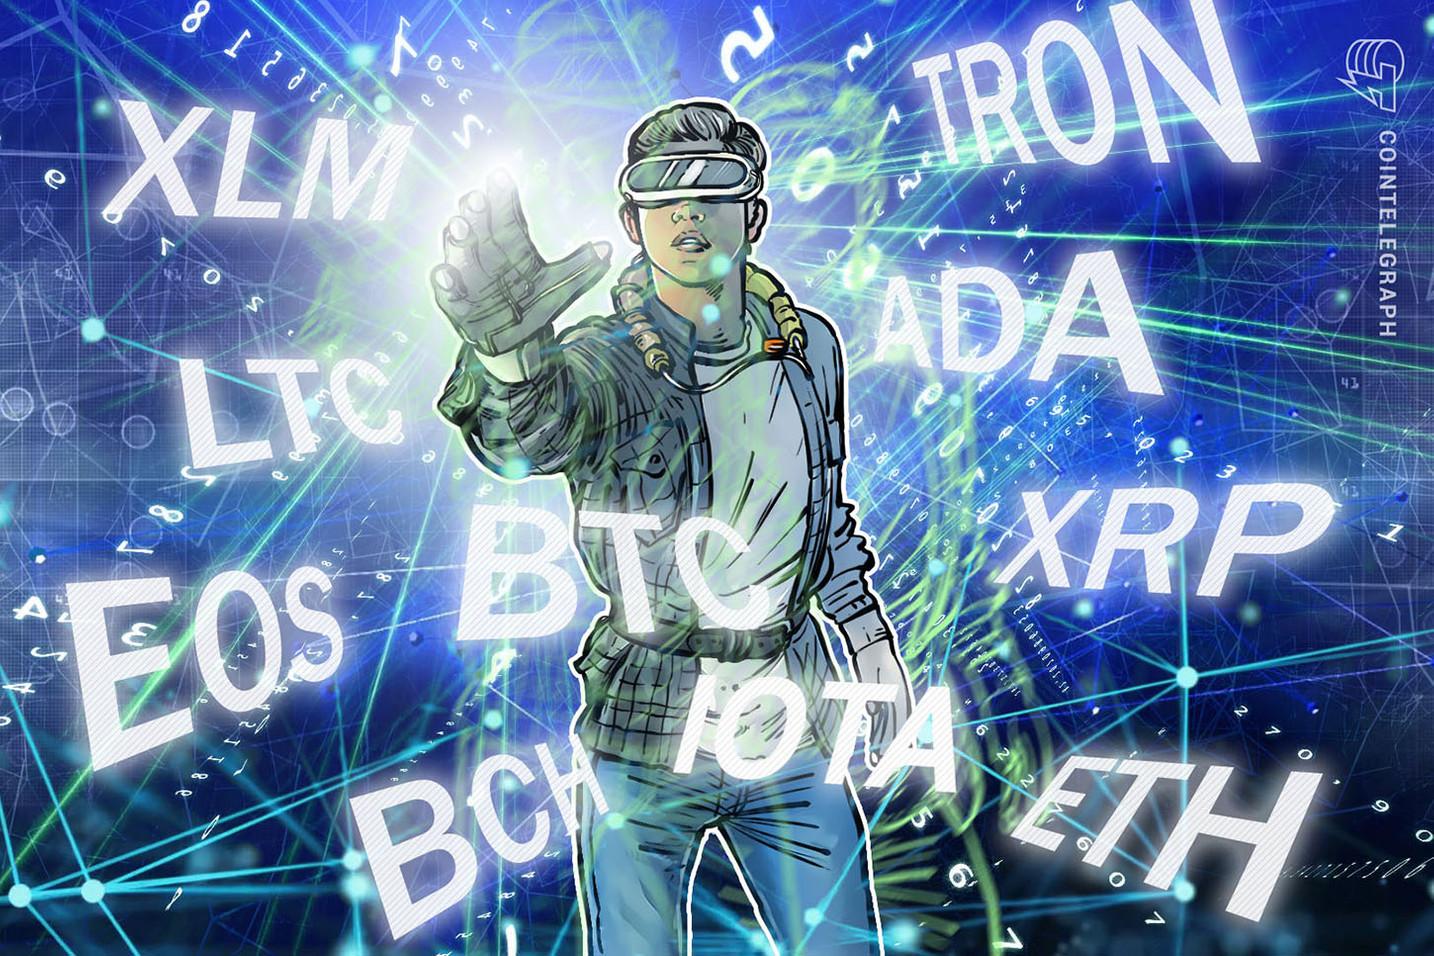 Bitkoin, itirijum, ripl, bitkoin keš, EOS, lajtkoin, kardano, stelar, IOTA, TRX: Analiza cena, 13. jul